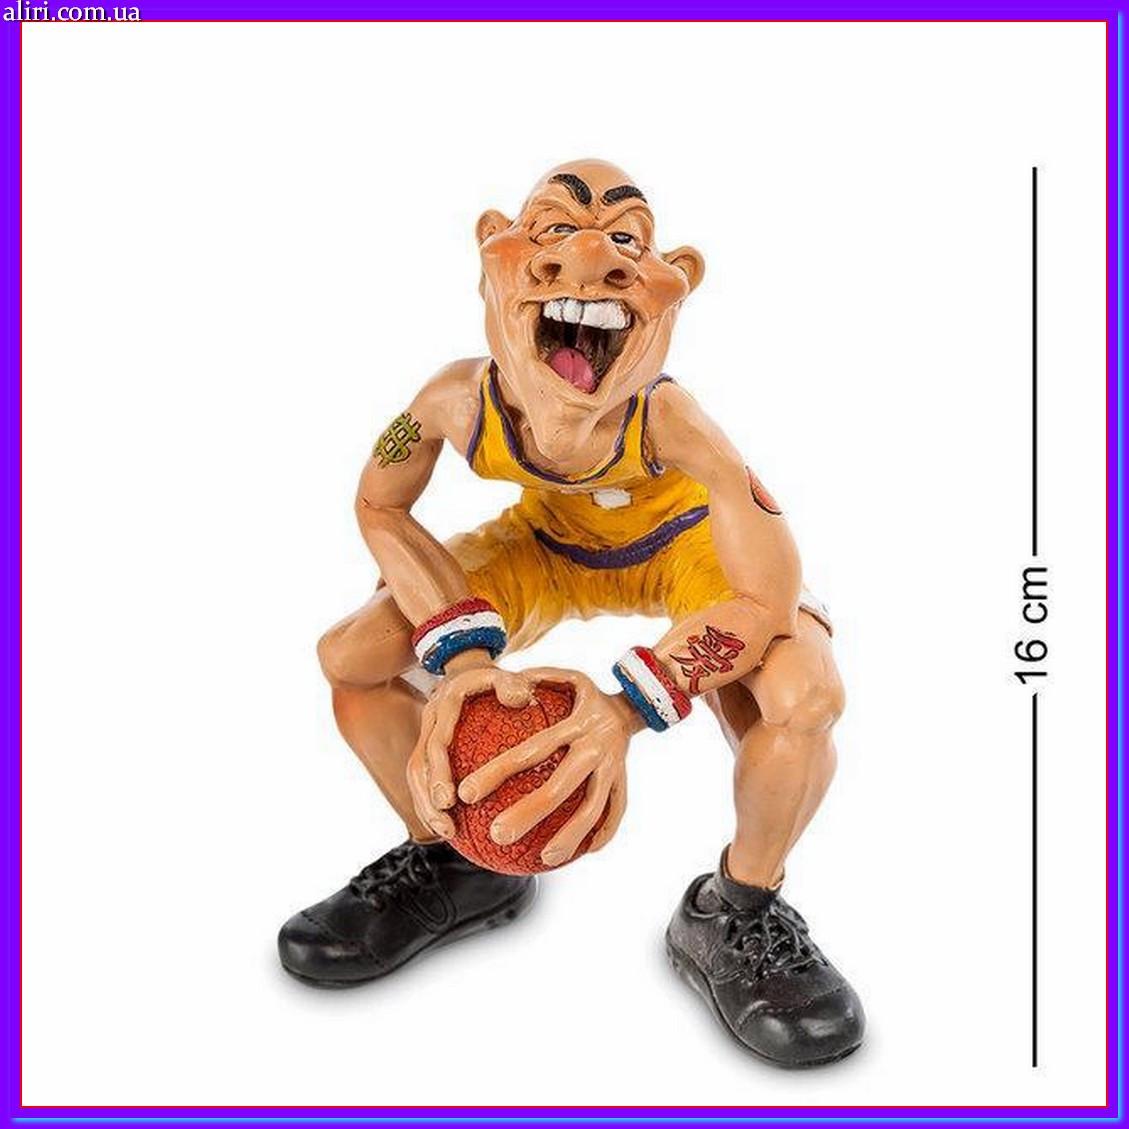 Статуэтка Баскетболист Stratford супер подарок